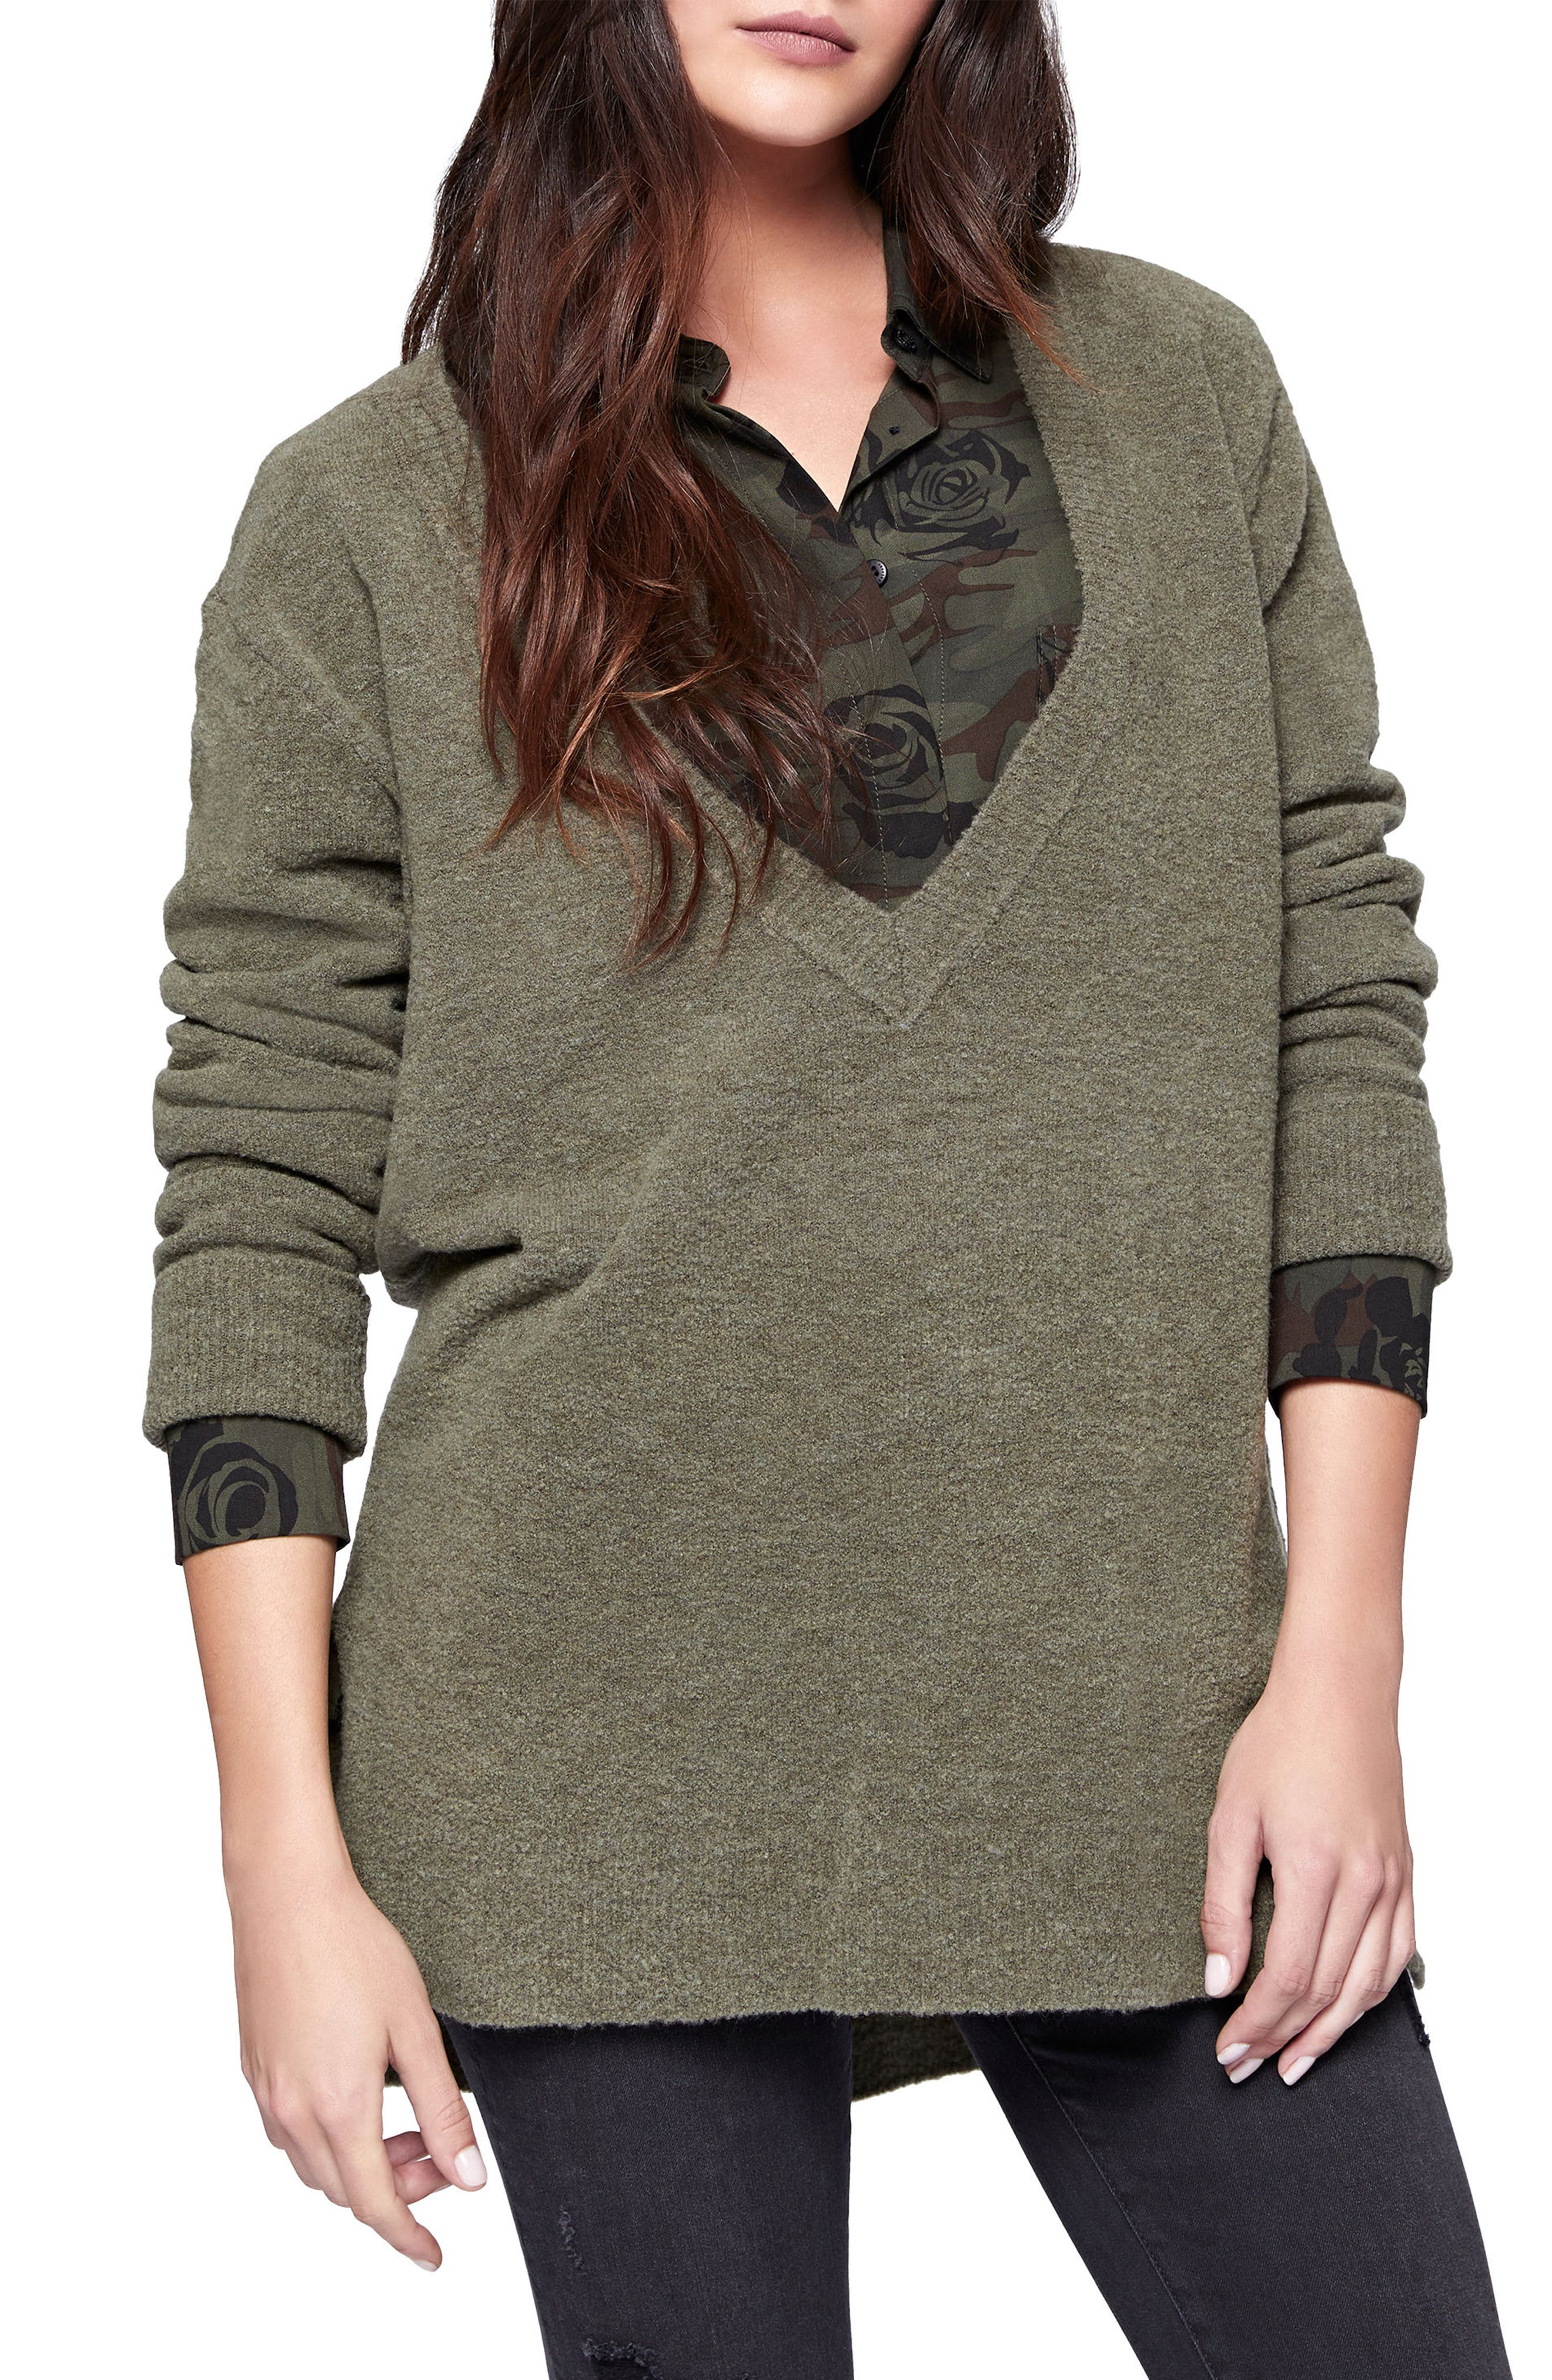 Santuary Delancey V-Neck Sweater,                             Main thumbnail 1, color,                             Fatigue